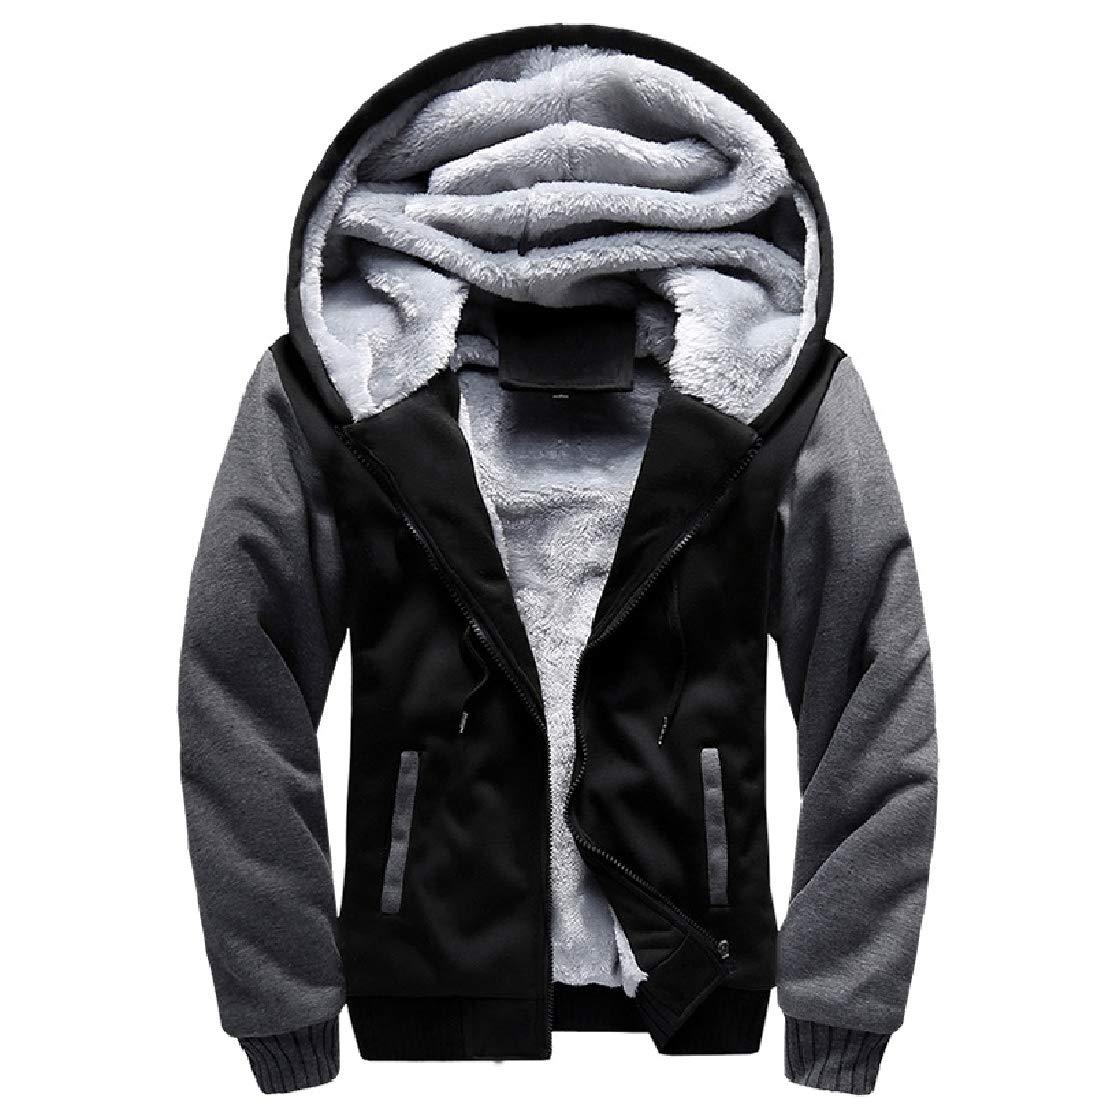 Doryti July Lady The Sweetest Most Beautiful Zip Hooded Sweatshirt